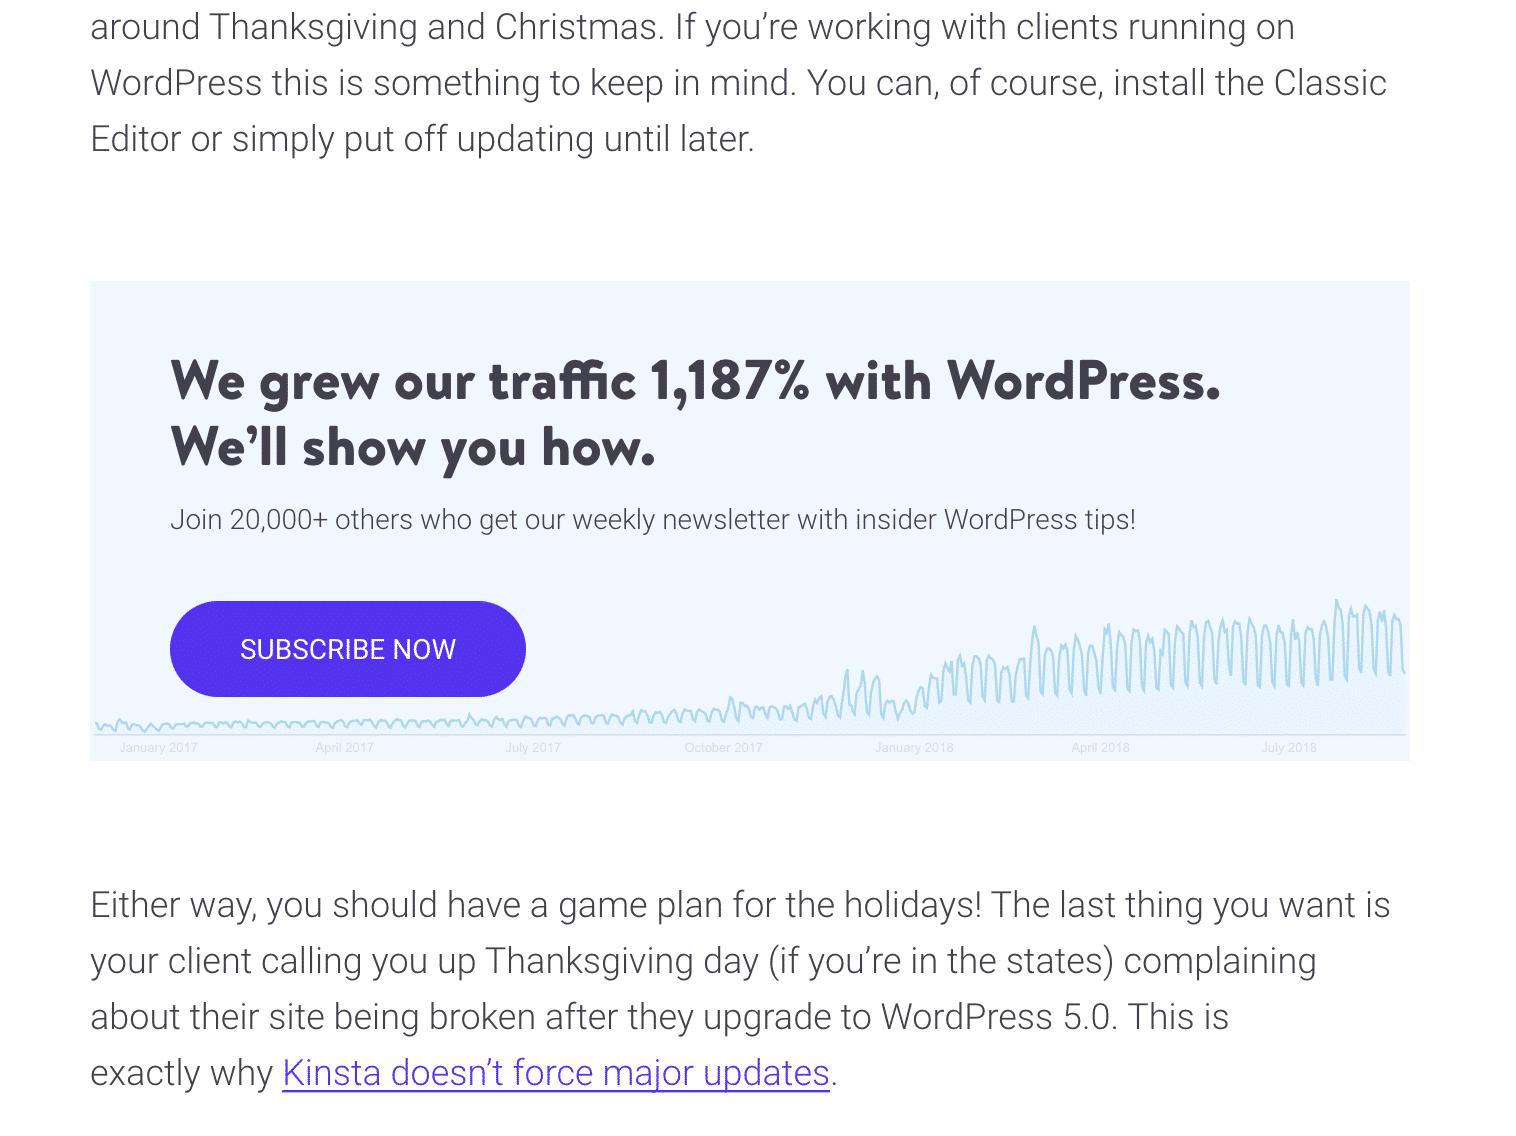 Kinsta blog e-mail aanmeldformulier